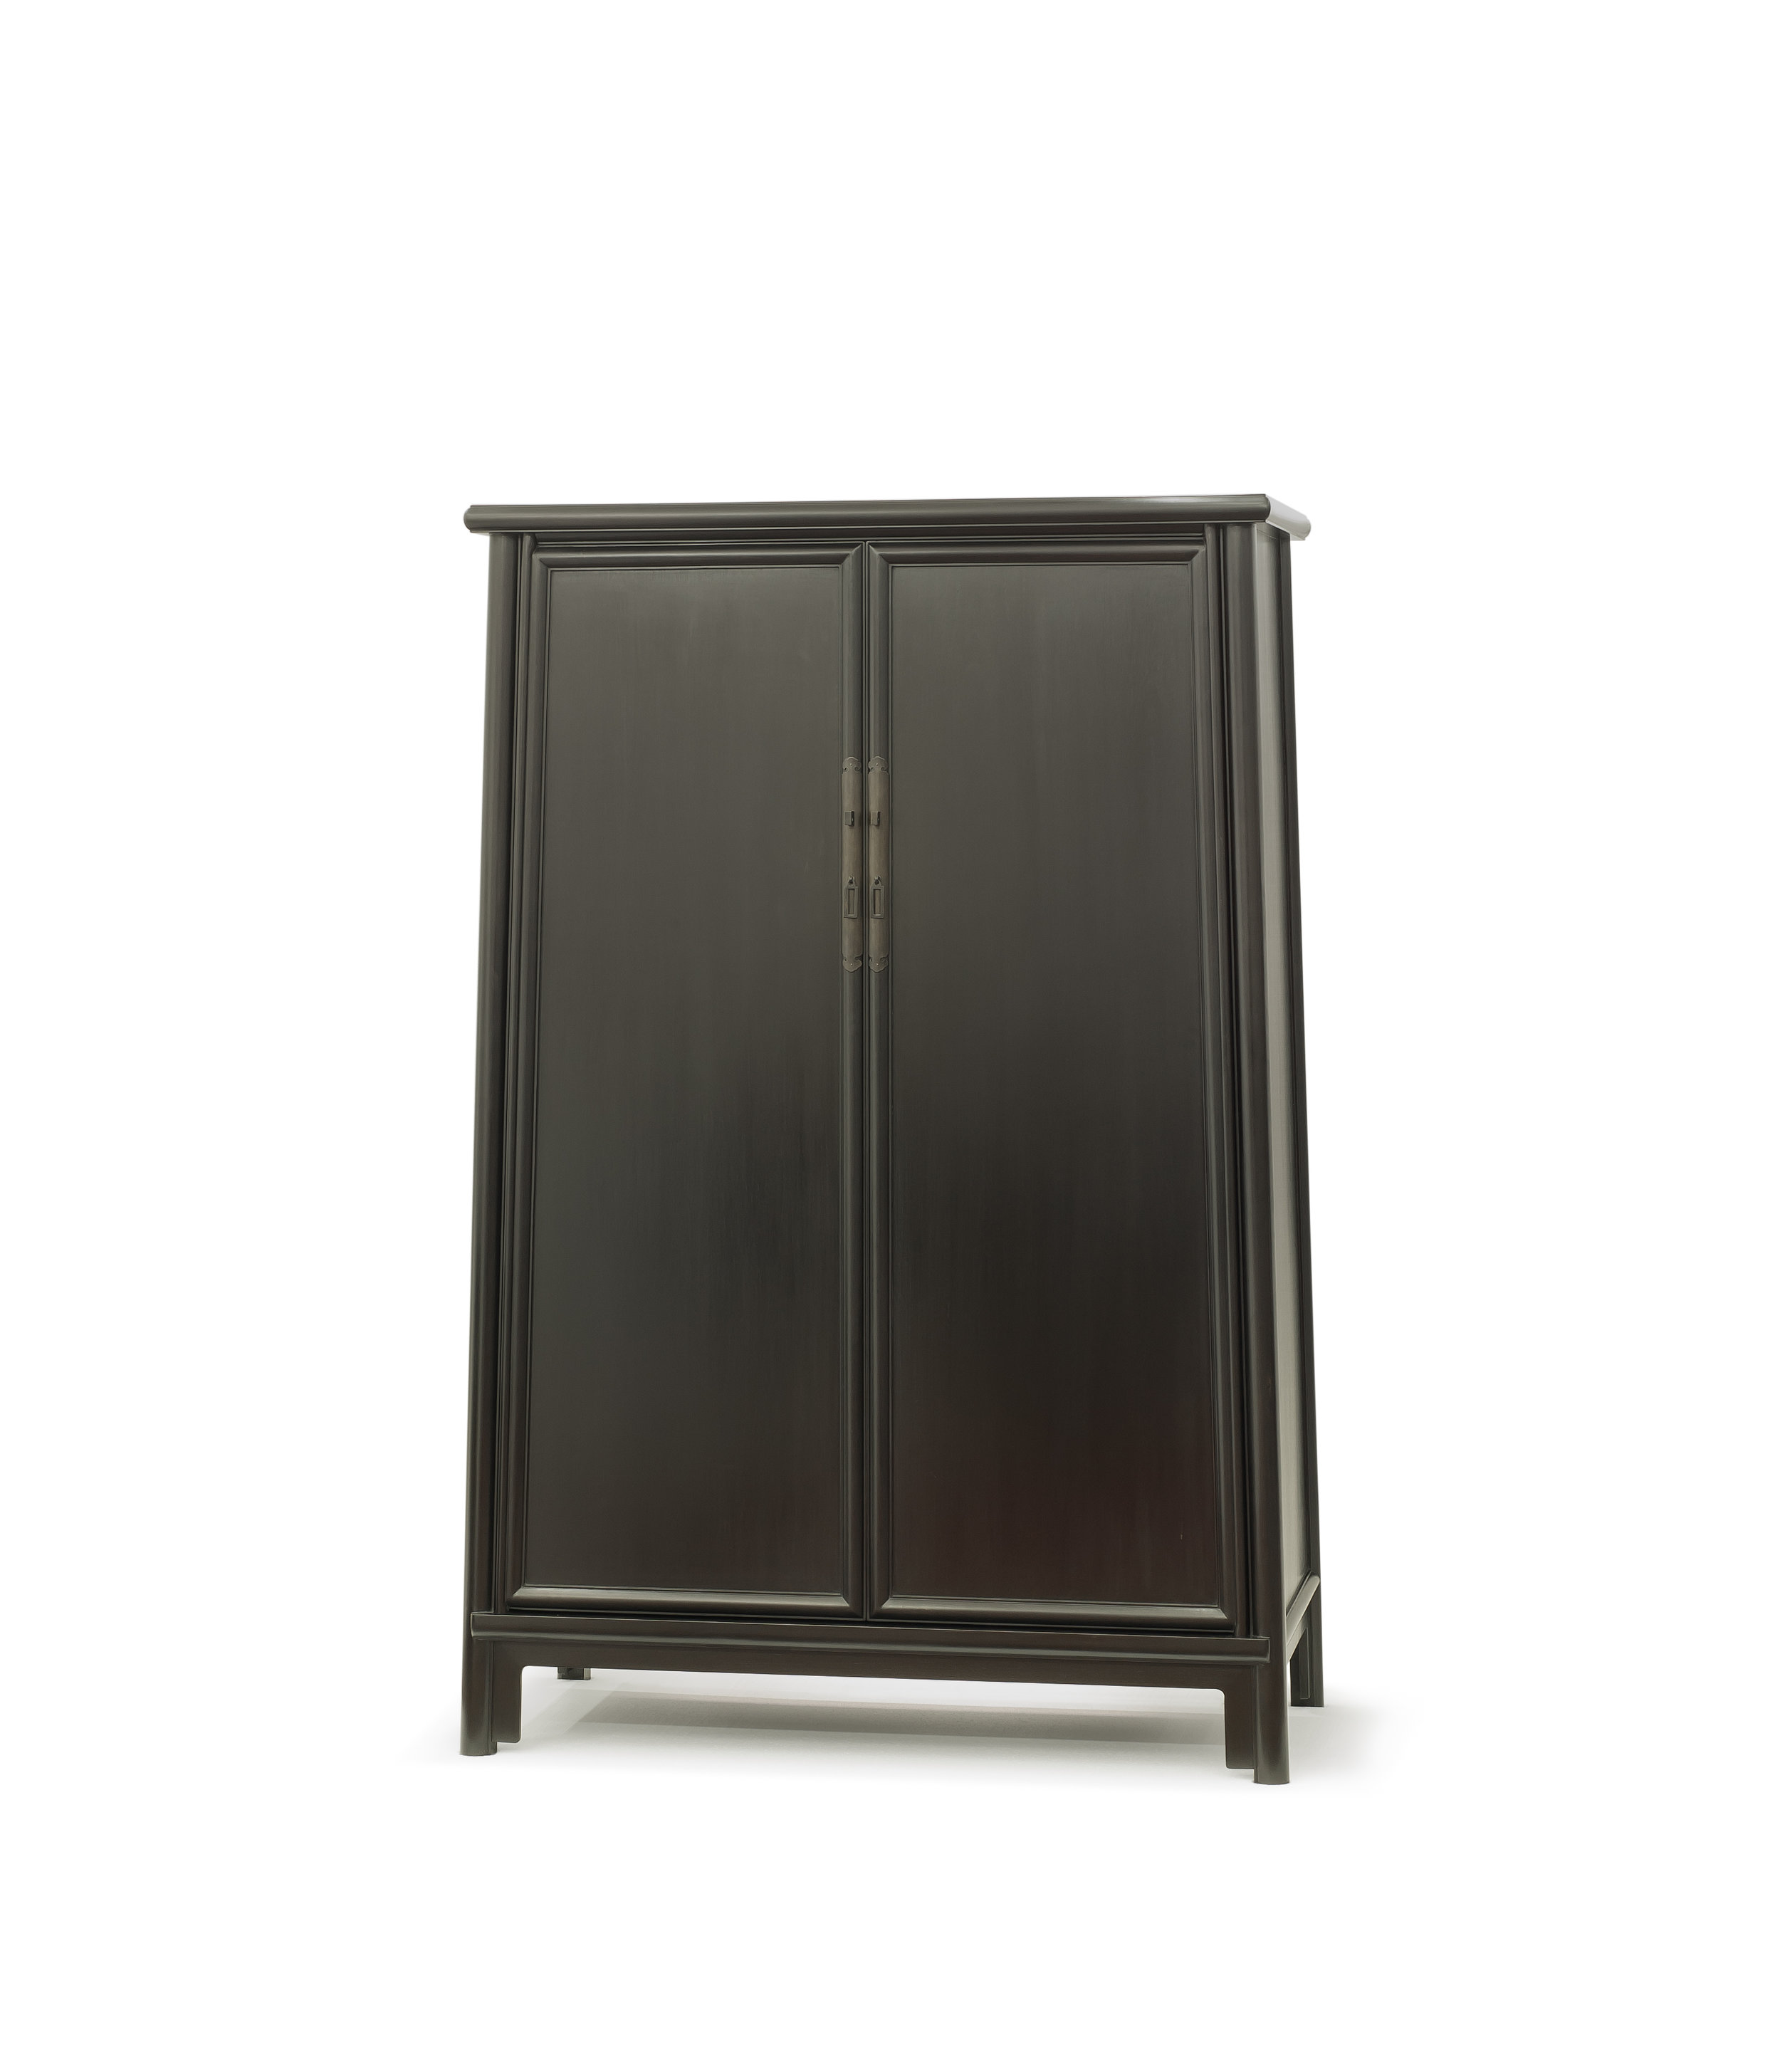 ....bespoke chinese ming style furniture   rosewood london : splay leg cabinet..特别定制中式明式家具   瑰丽伦敦酒店:面条柜....